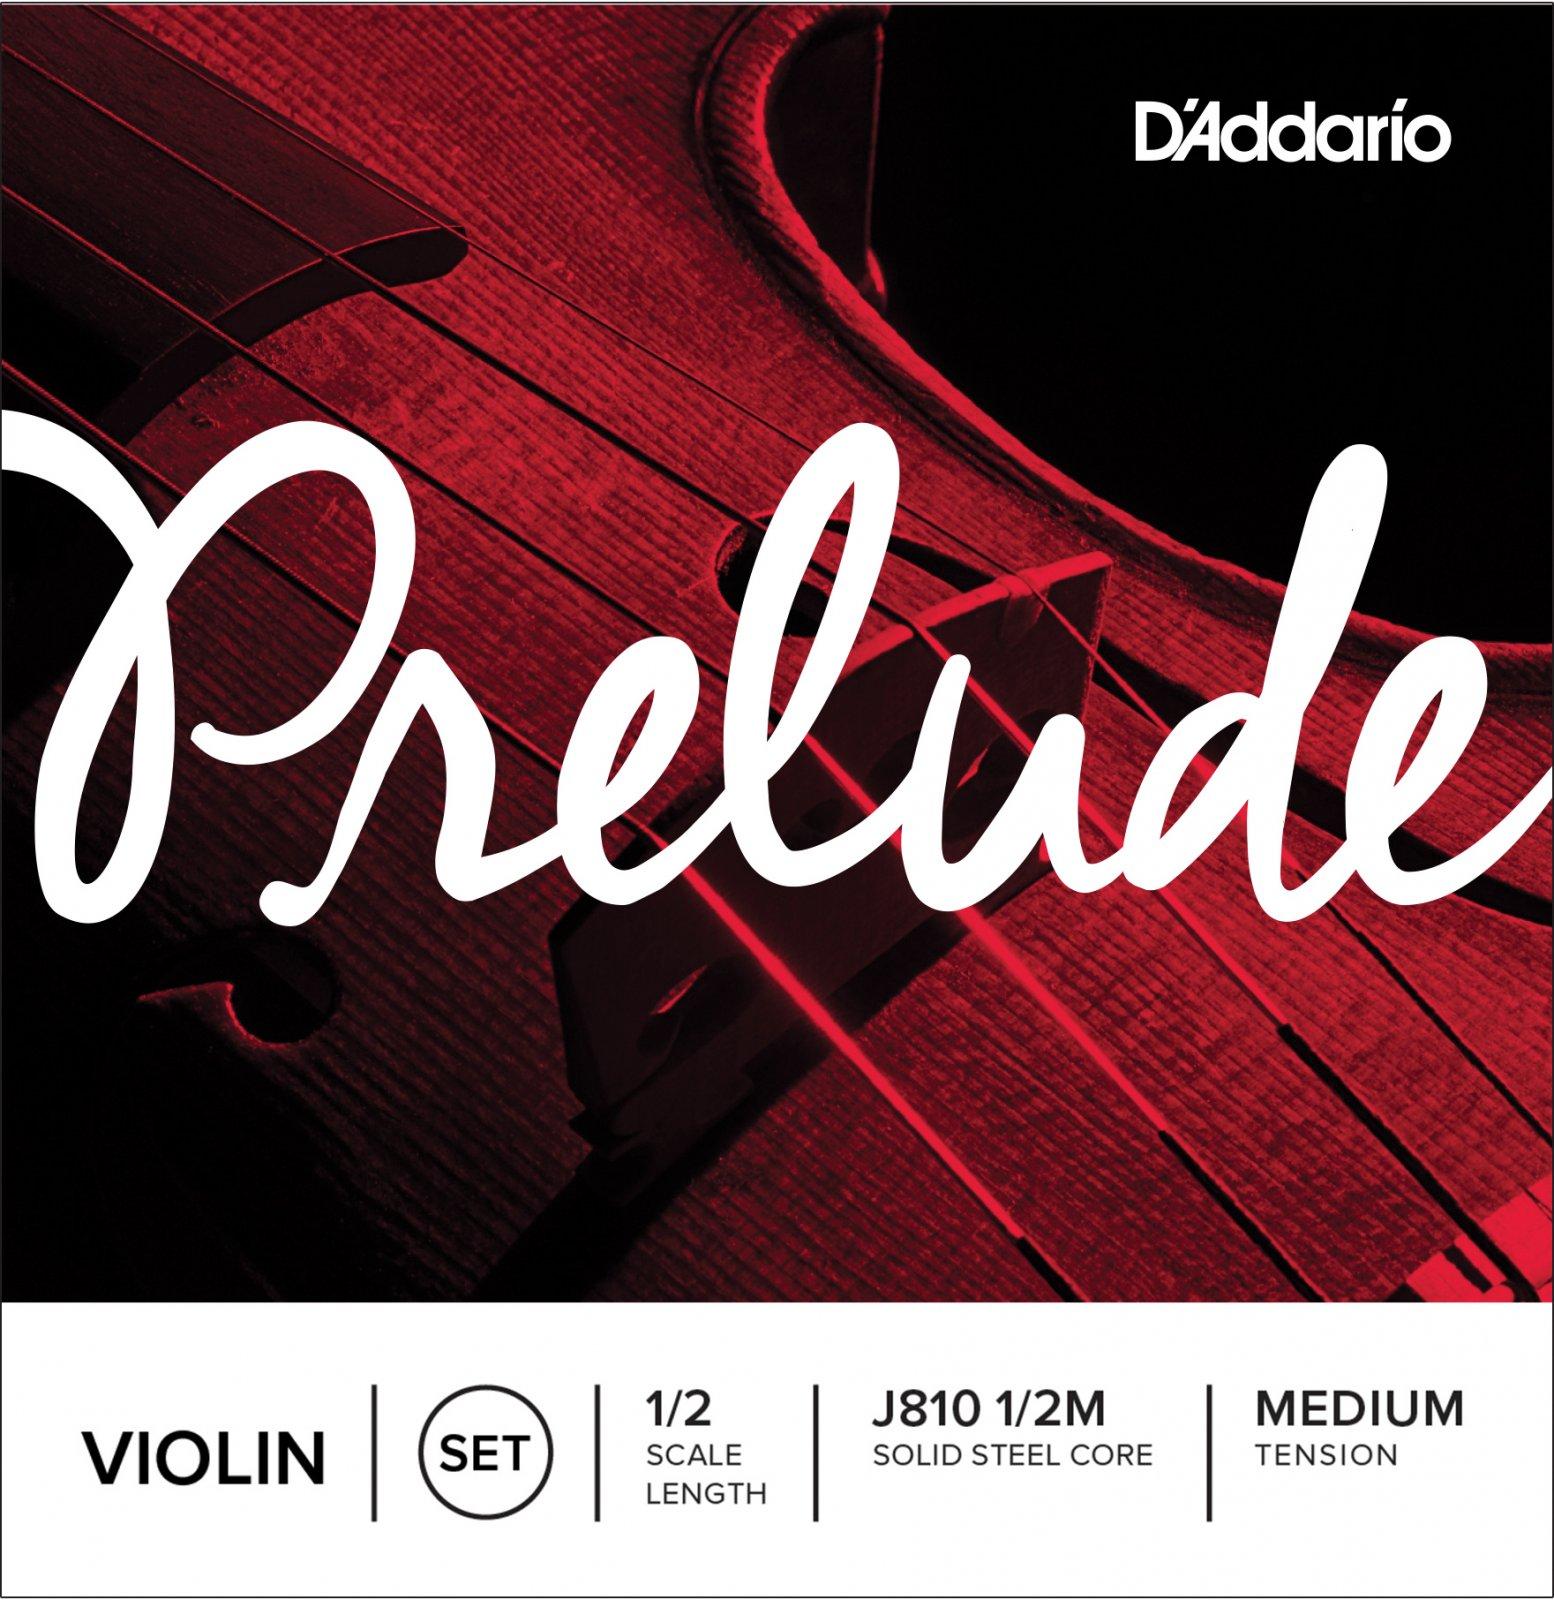 D'Addario Prelude Violin String Set 1/2 (J810)